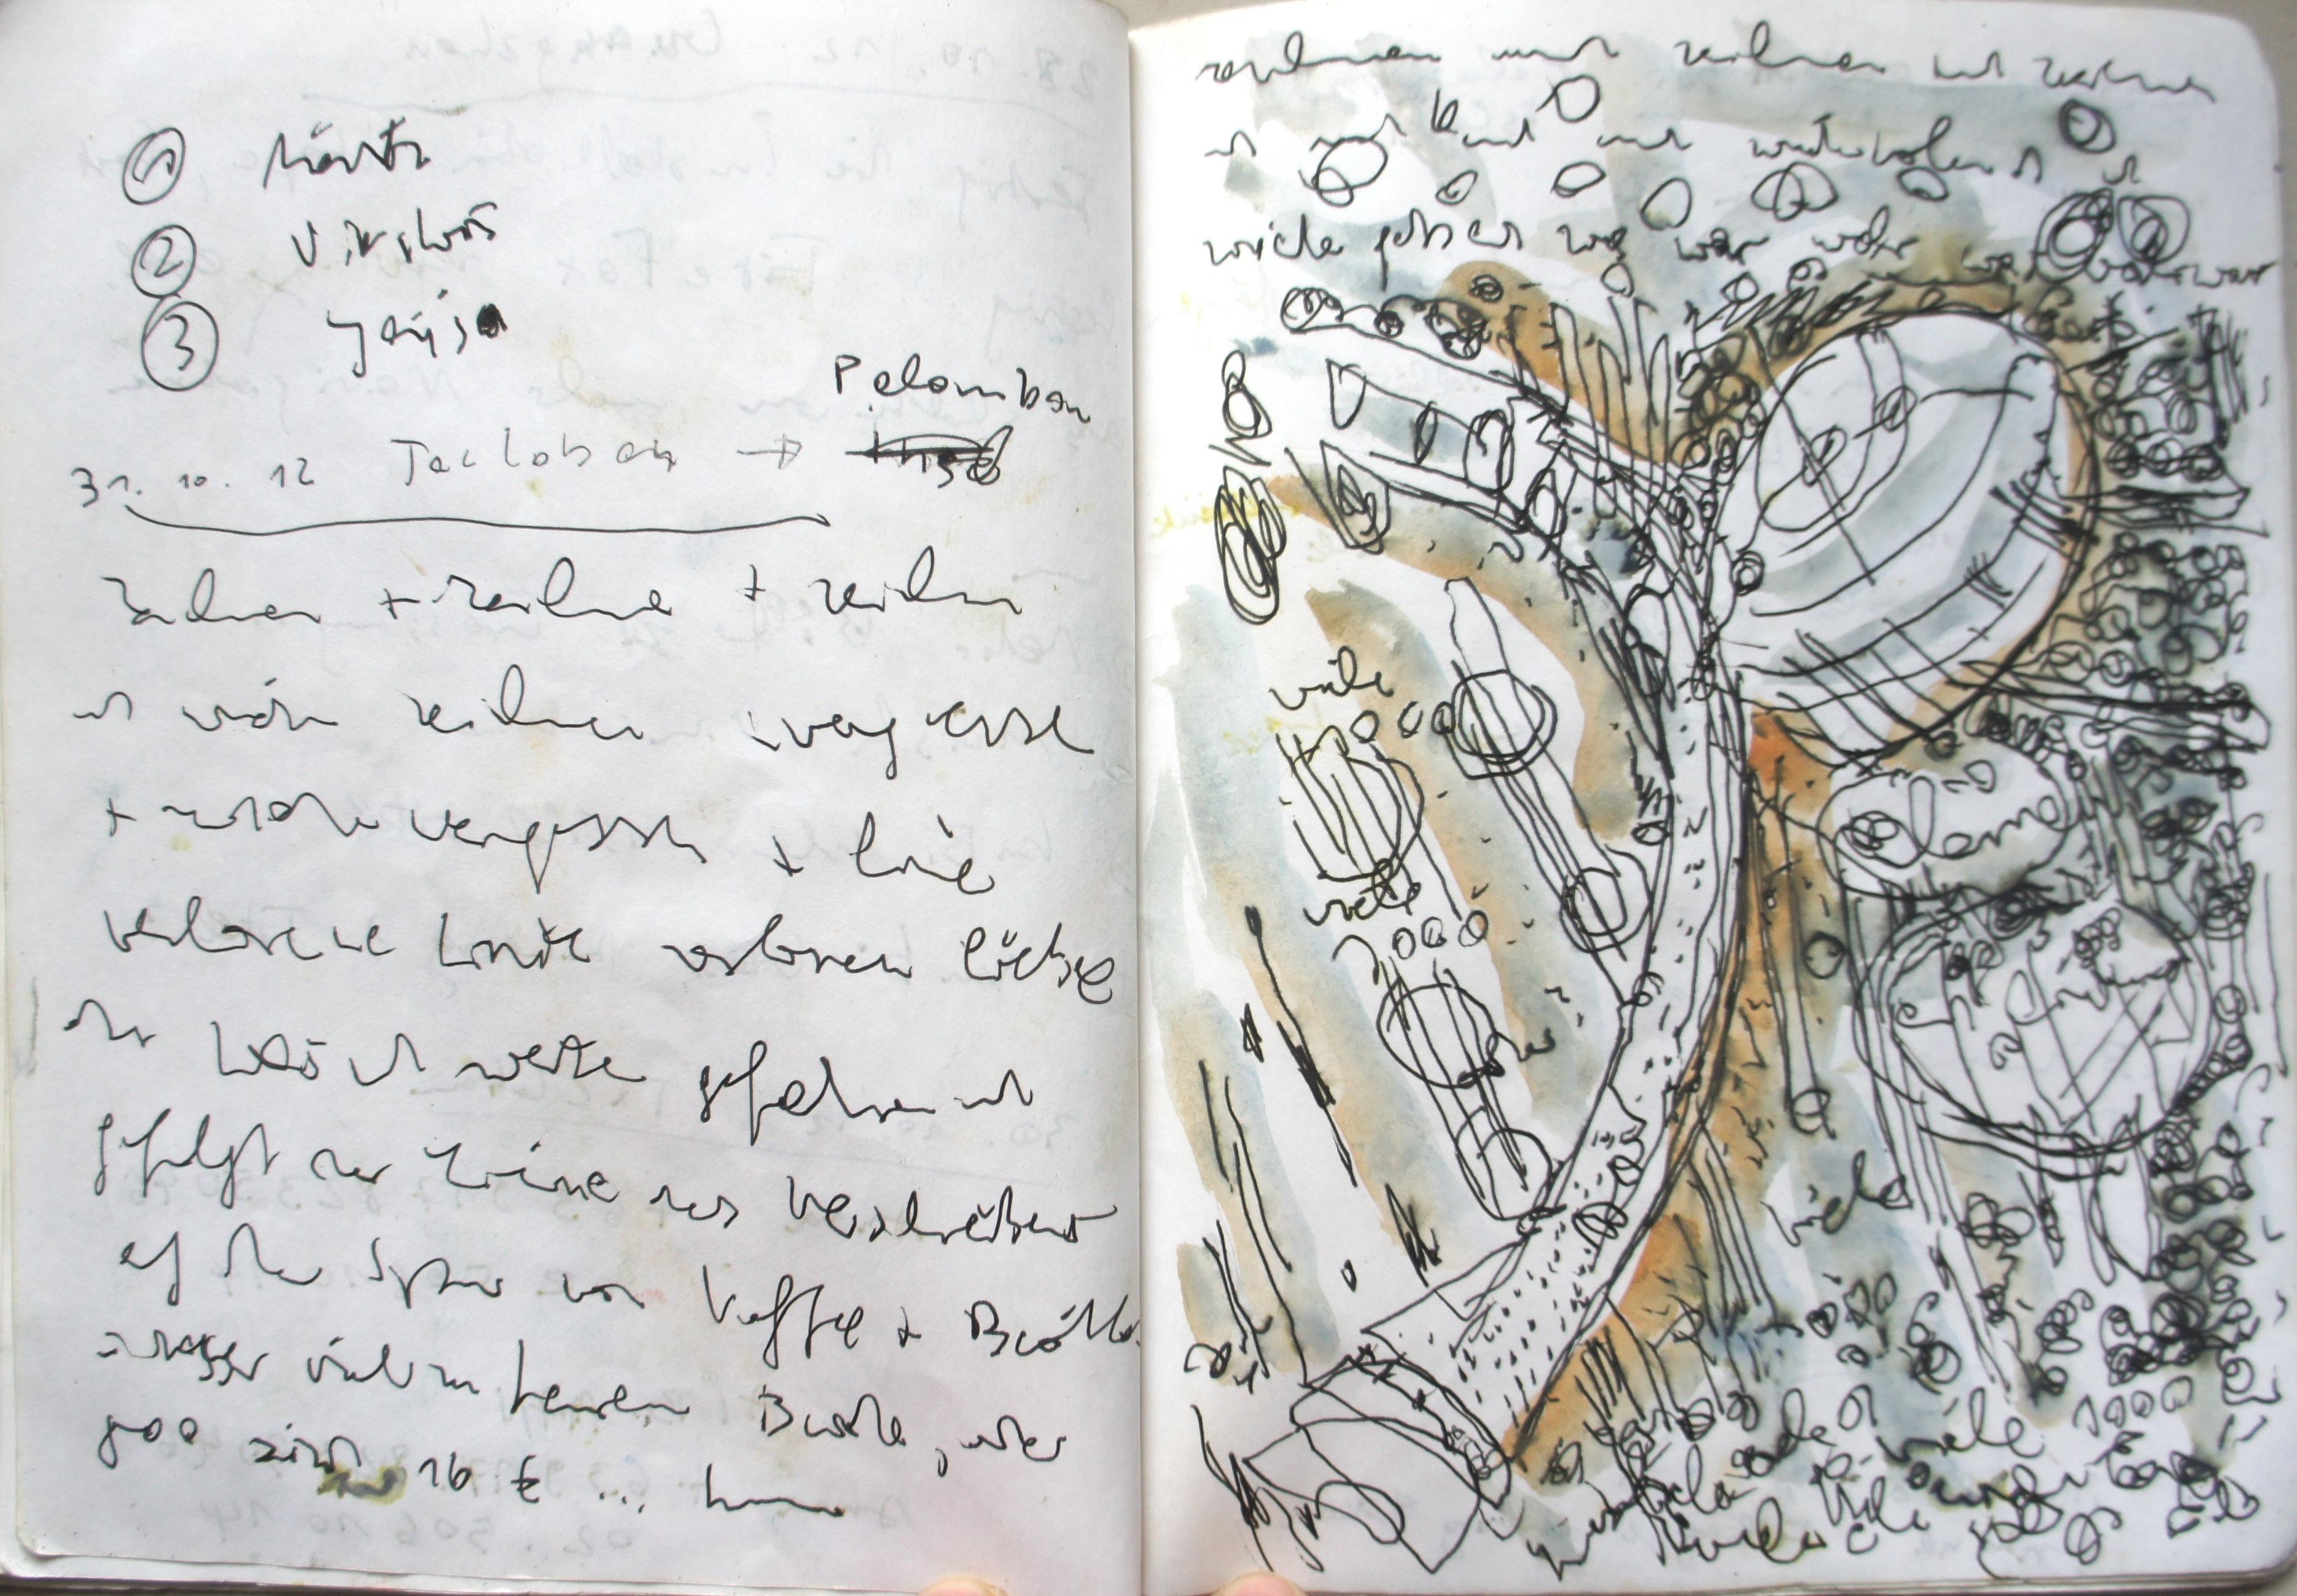 Tacloban Writings